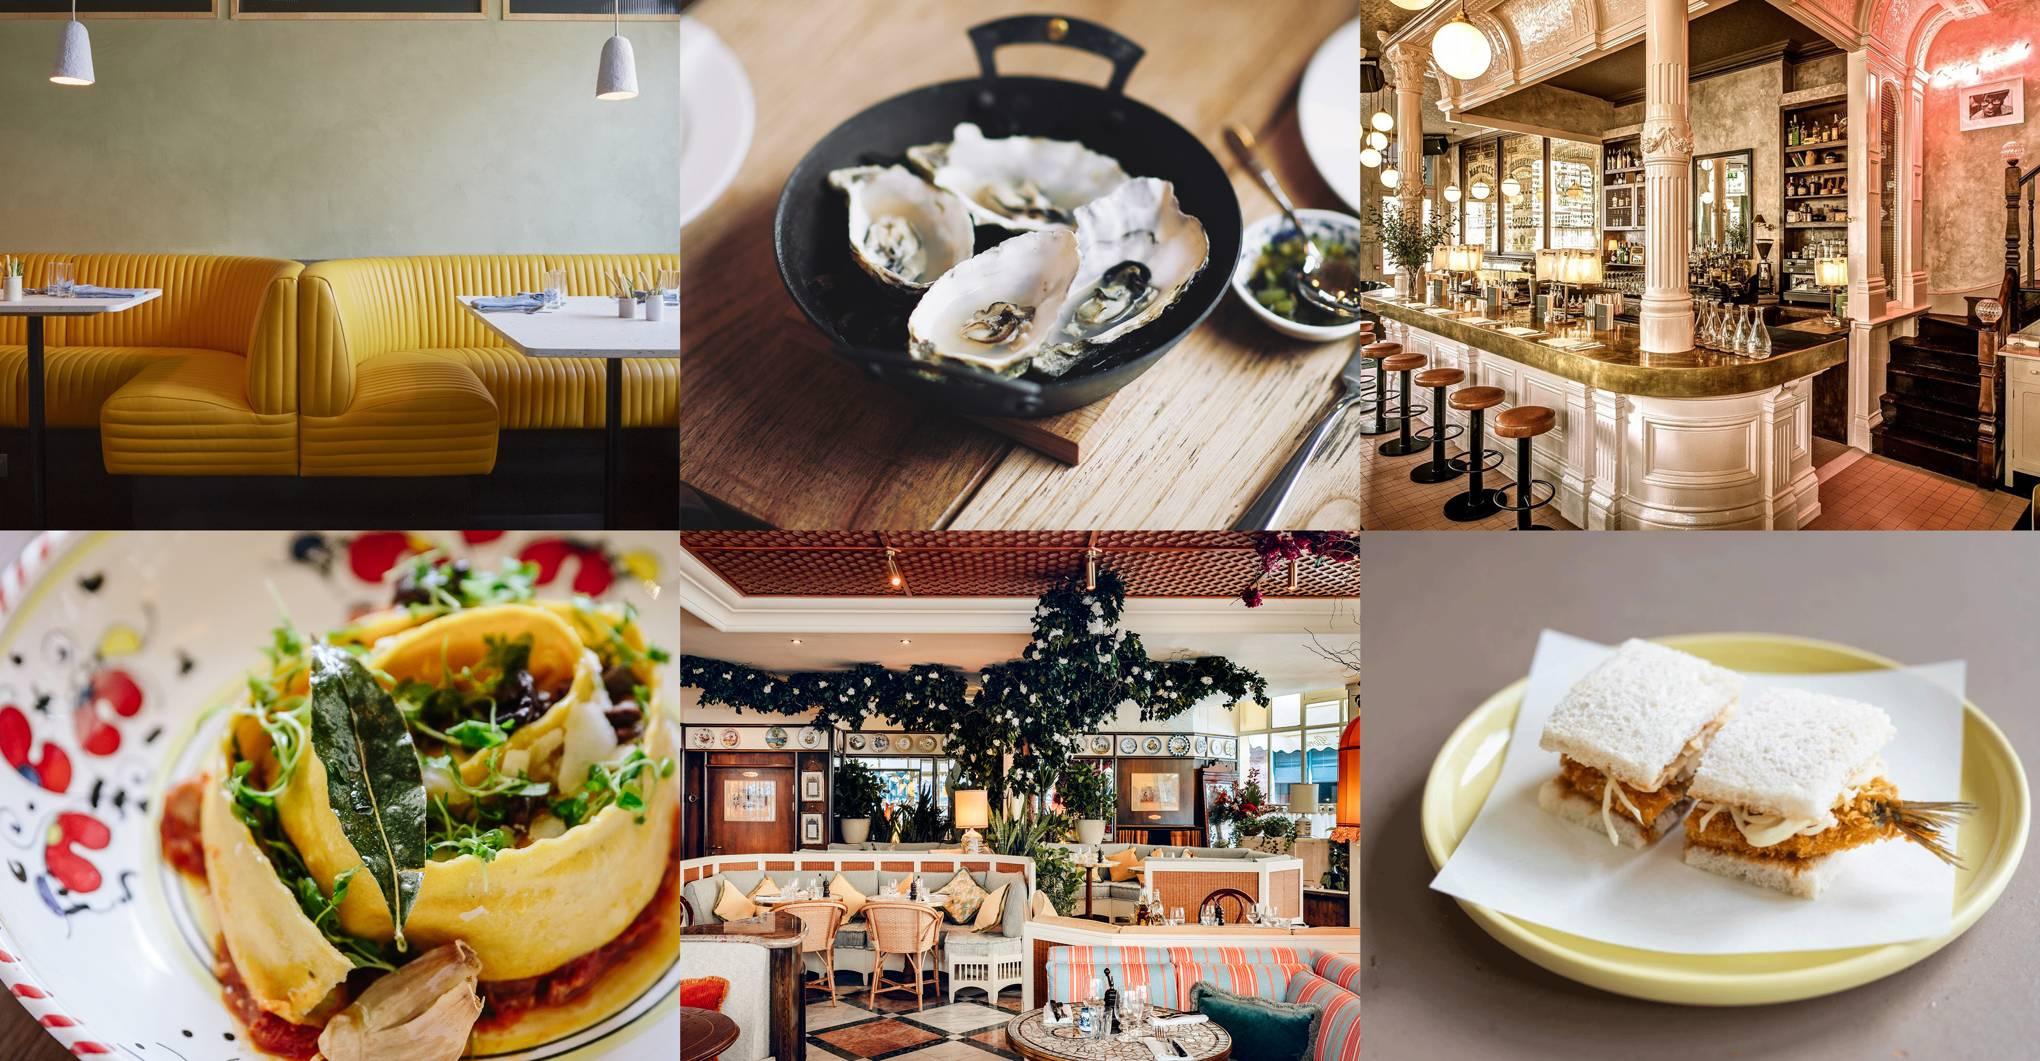 Shoreditch restaurants: The 16 best